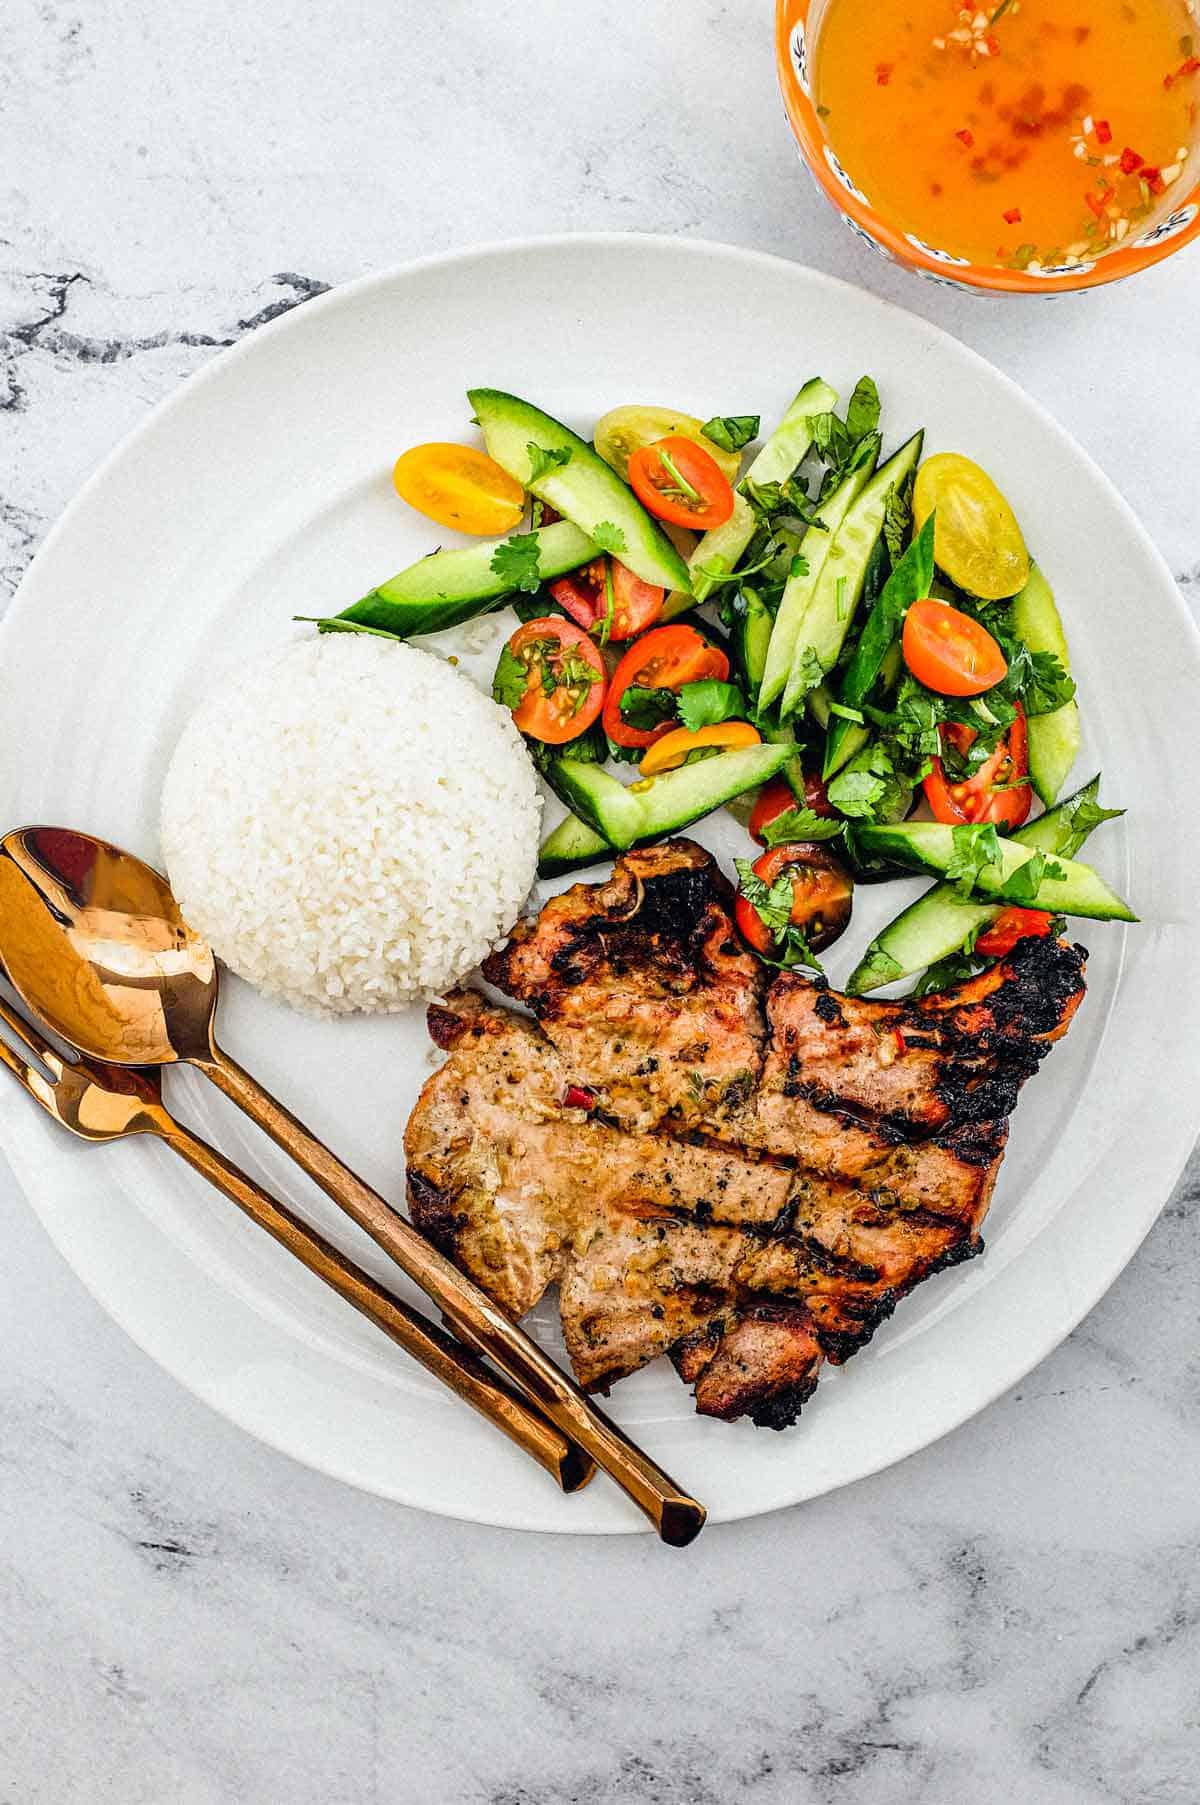 Vietnamese Grilled Lemongrass Pork Chops (Thit Heo Nuong Xa)